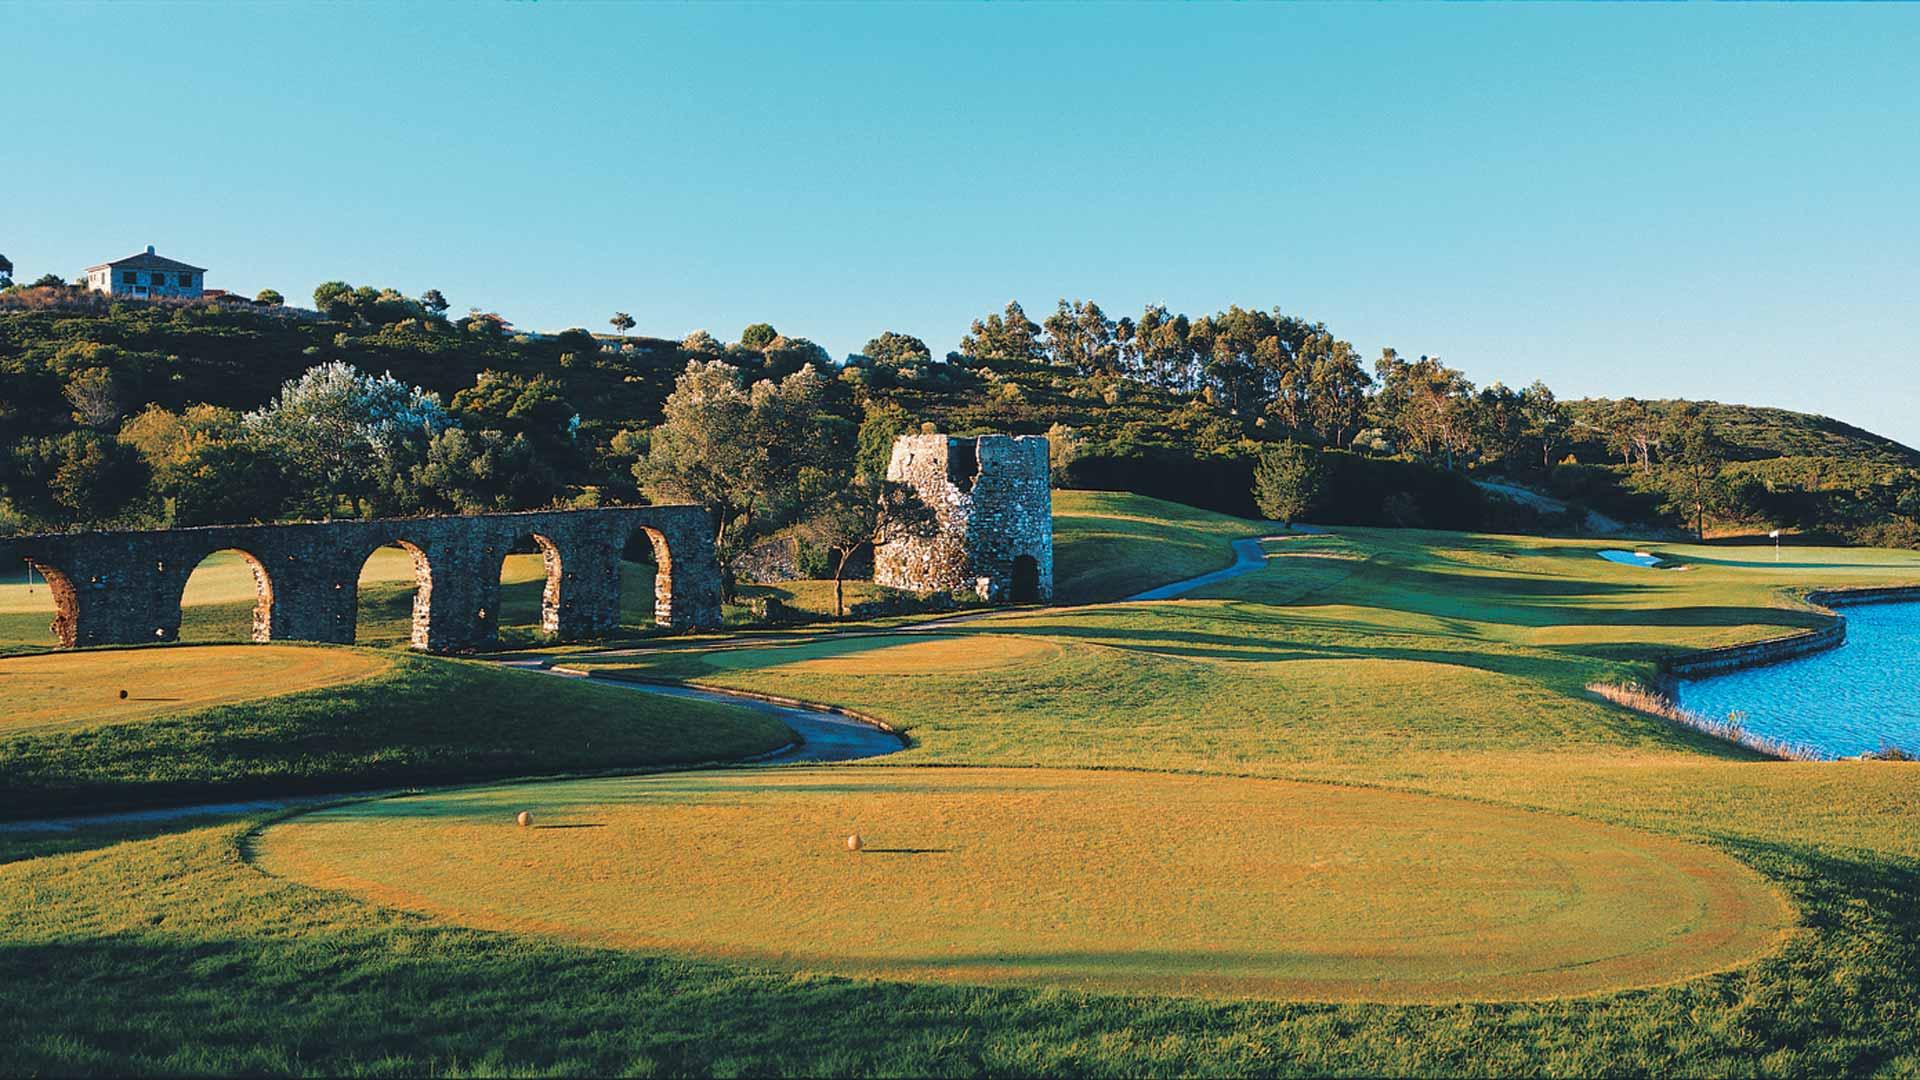 penha-longa-golf-course-1